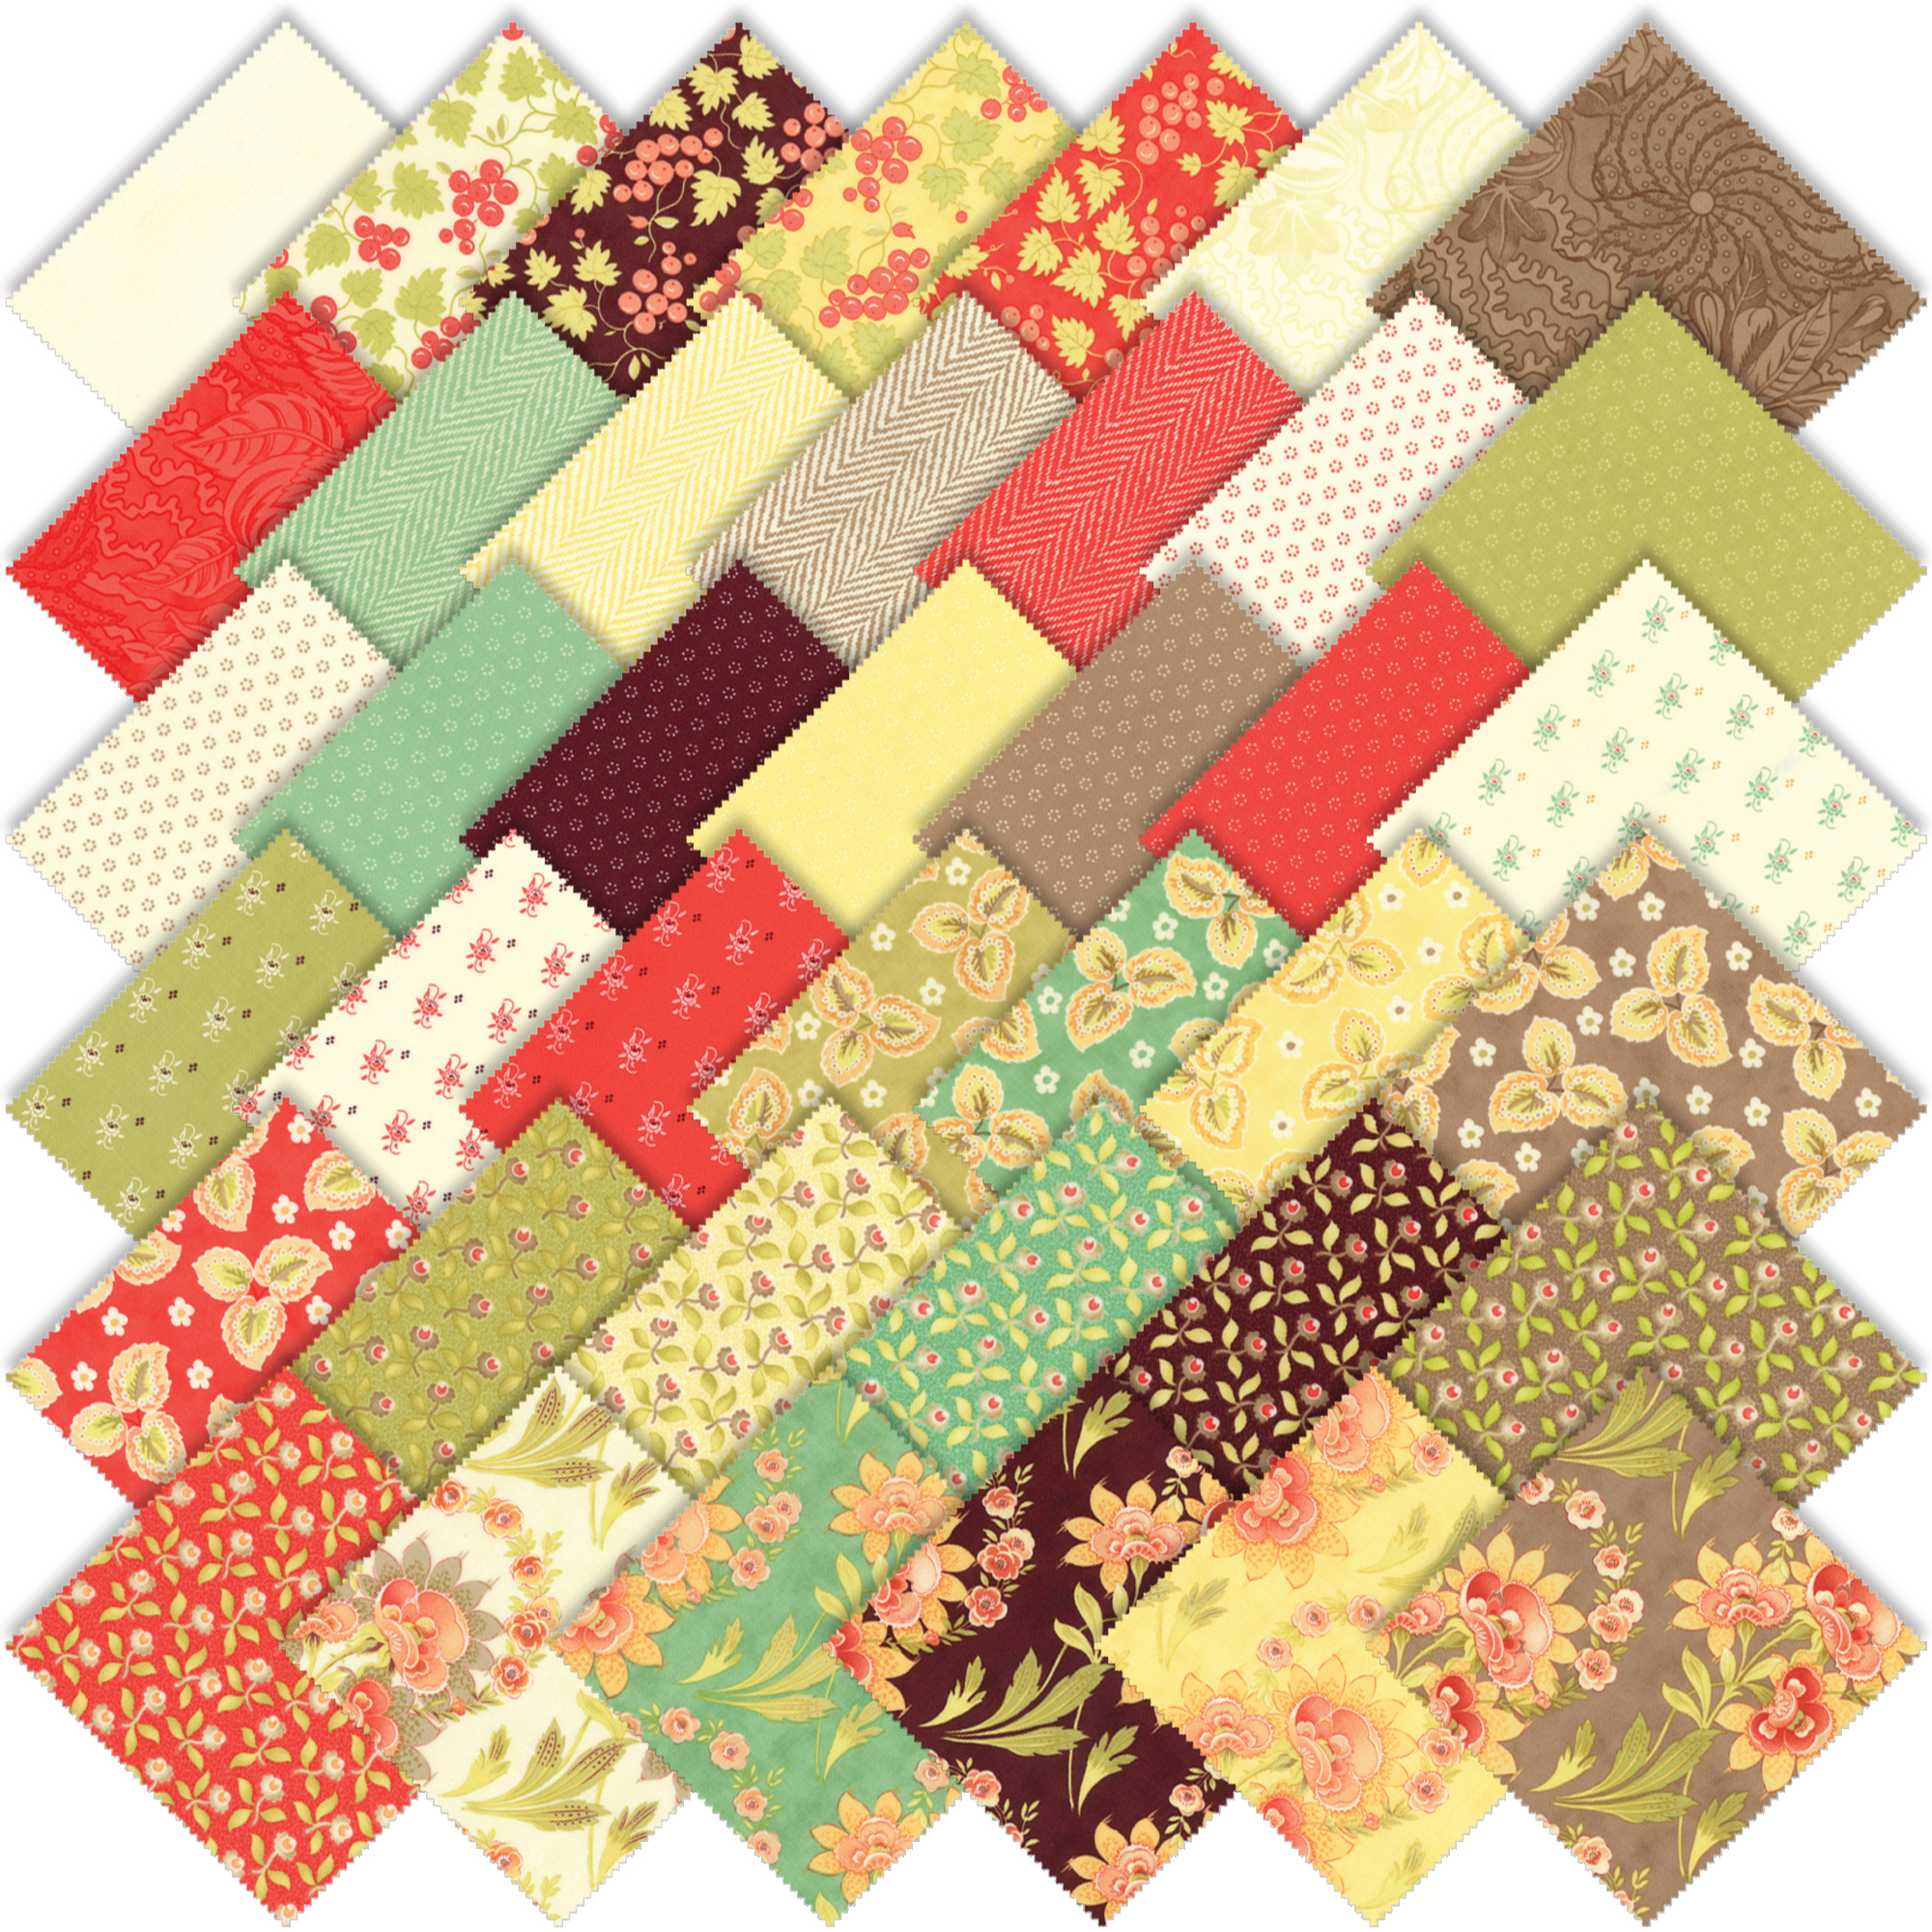 Hazel and Plum Fabric Moda Fabric Moda Bundle 9 pieces Fig Tree Quilts Hazel /& Plum RedGreen One Yard Bundle